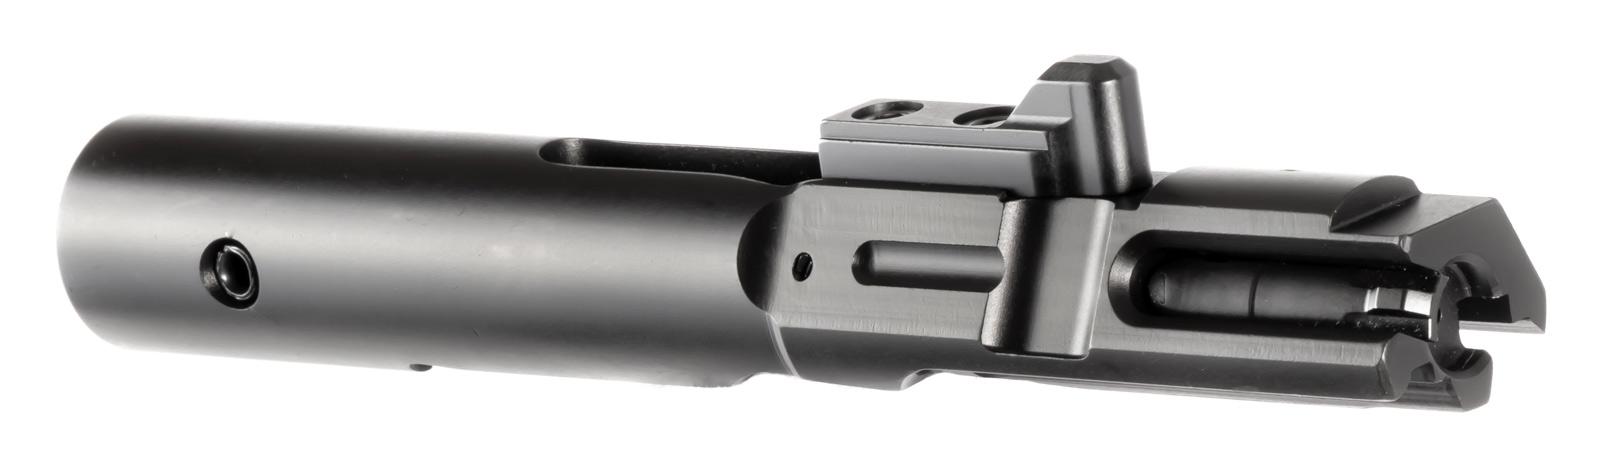 AR-9 Pistol Kit - 7 5